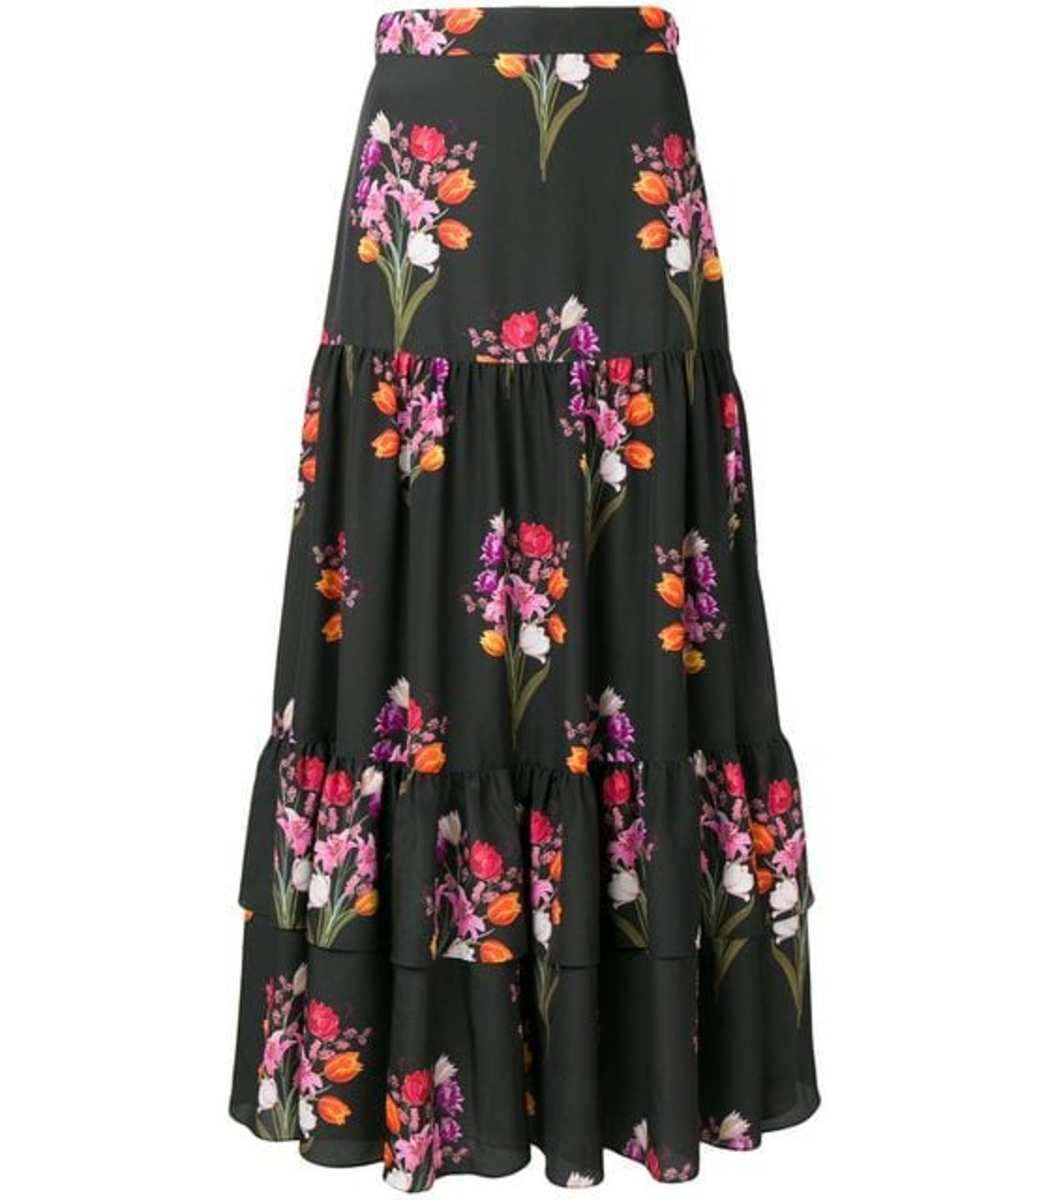 Borgo De Nor Emme Floral Print Skirt